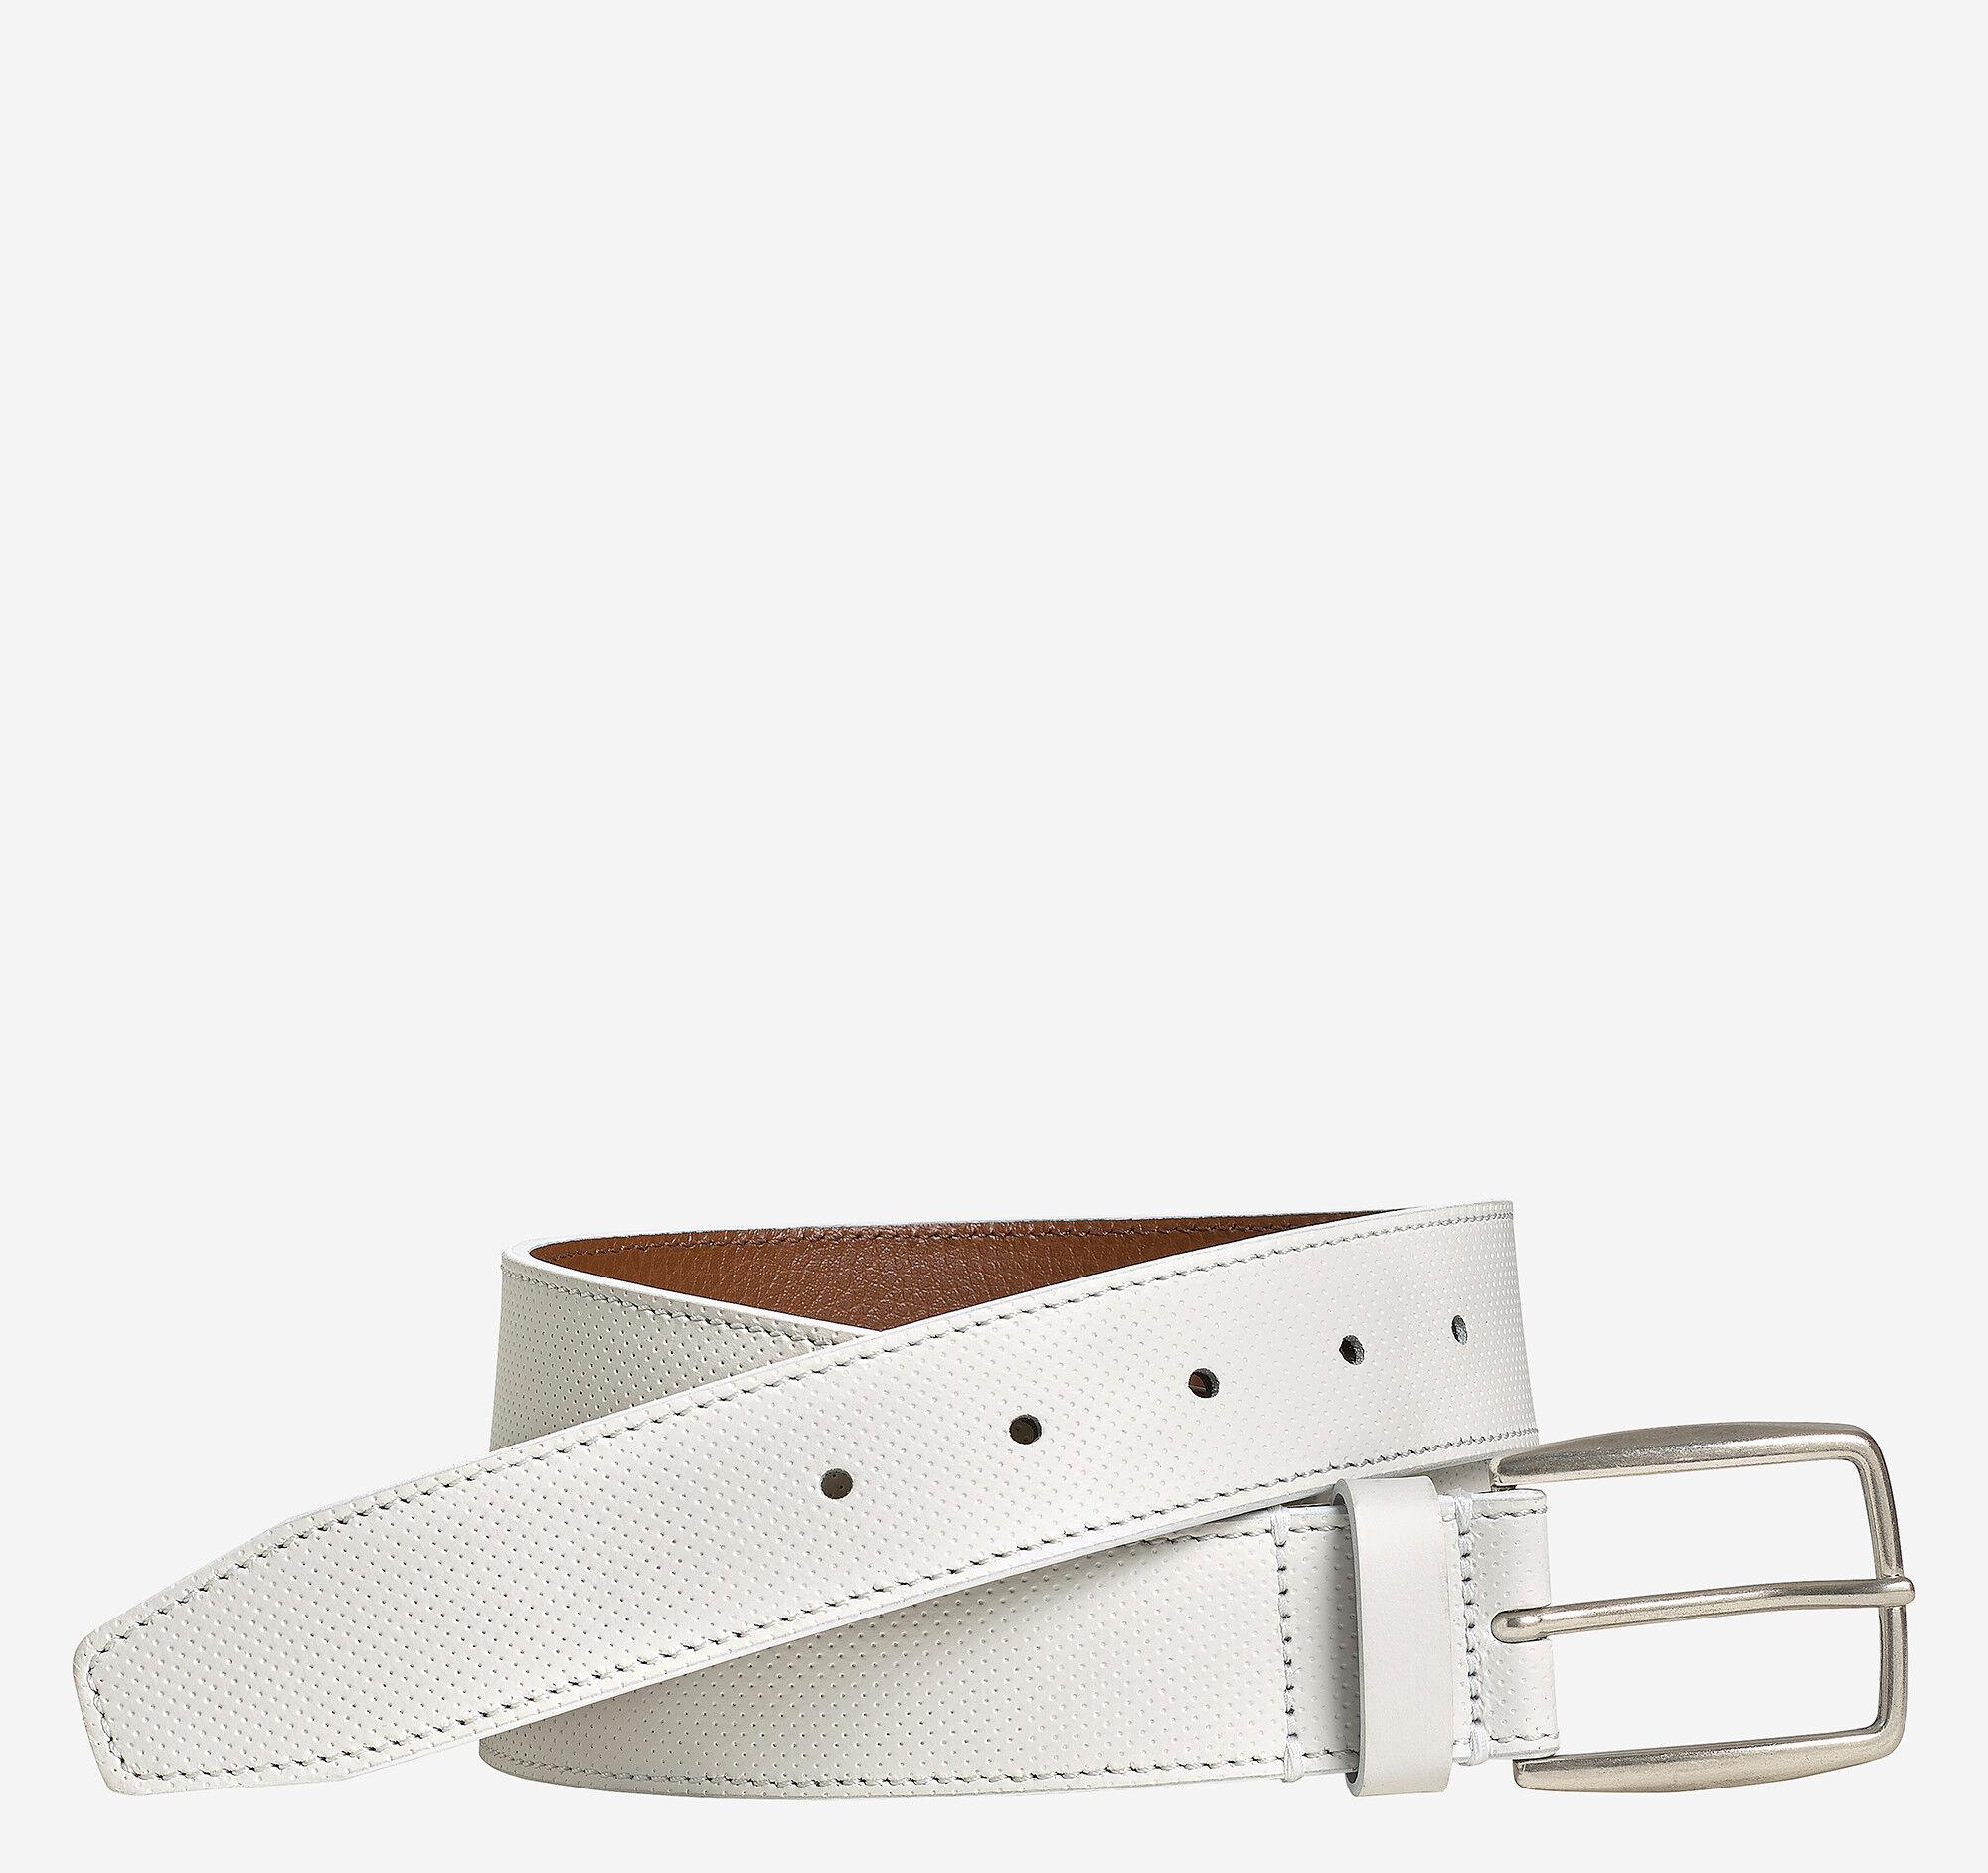 Johnston & Murphy Men's Mini-Perfed Belt - White Full Grain Leather - Size 32